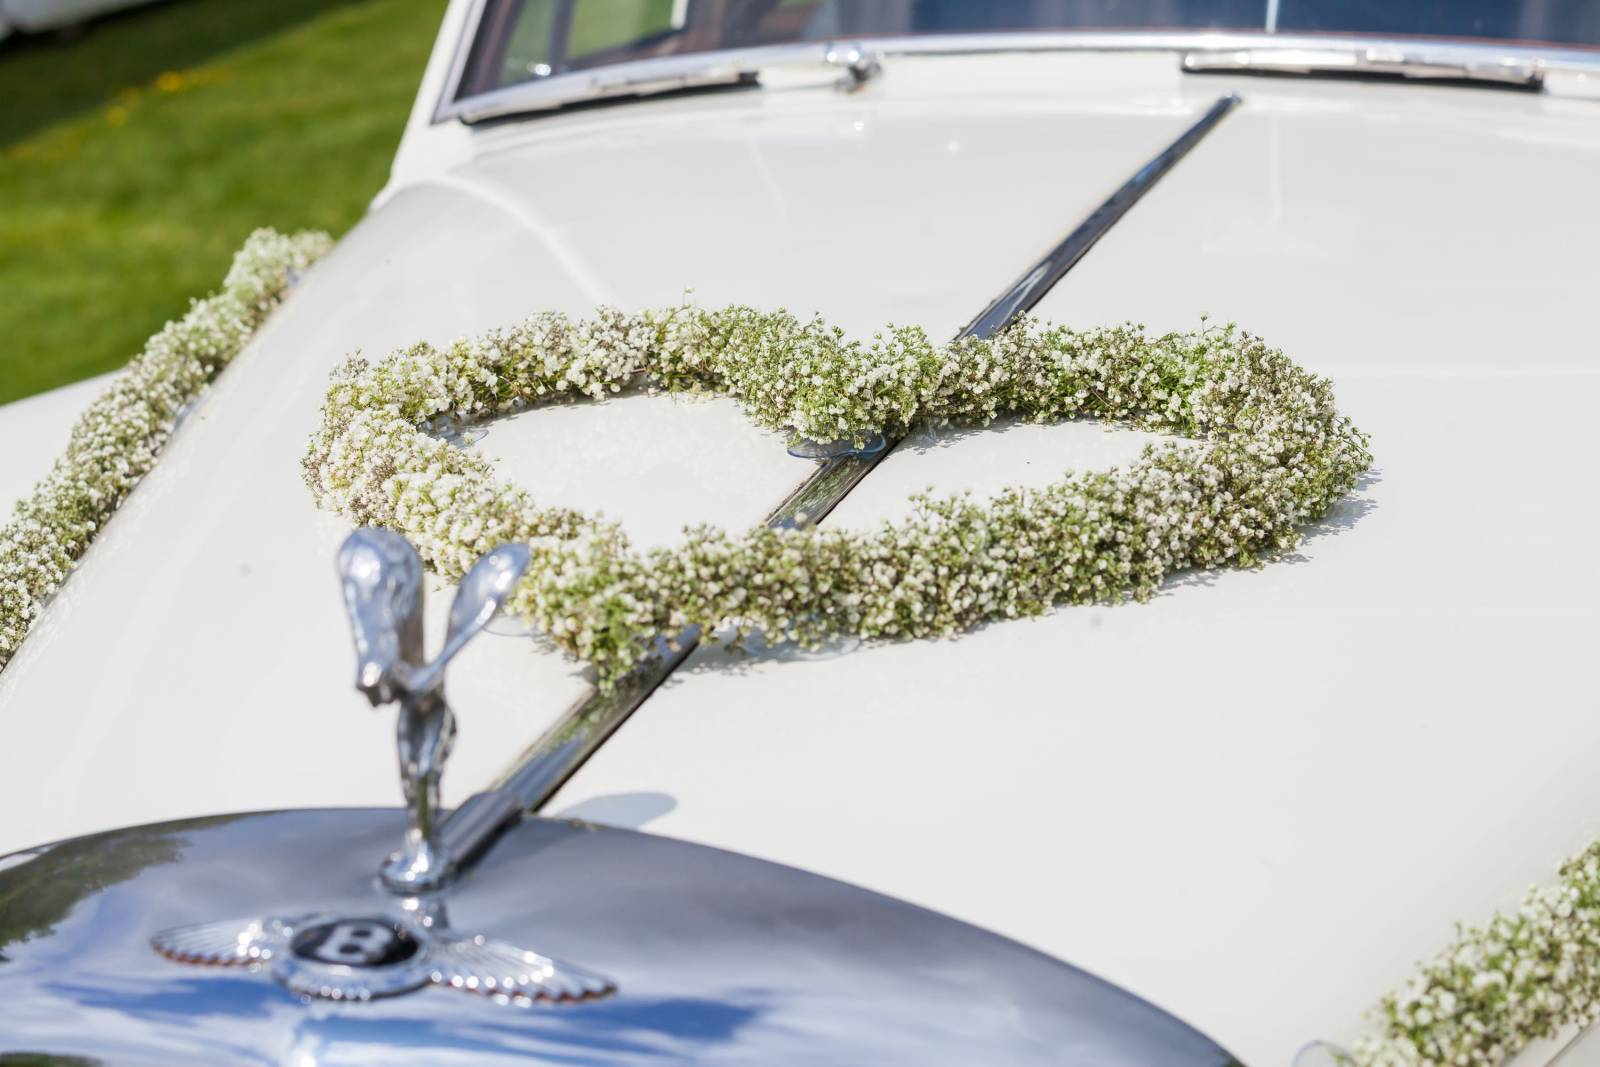 Carpe Diem Bloemen & Decoratie - House of Weddings  - 30